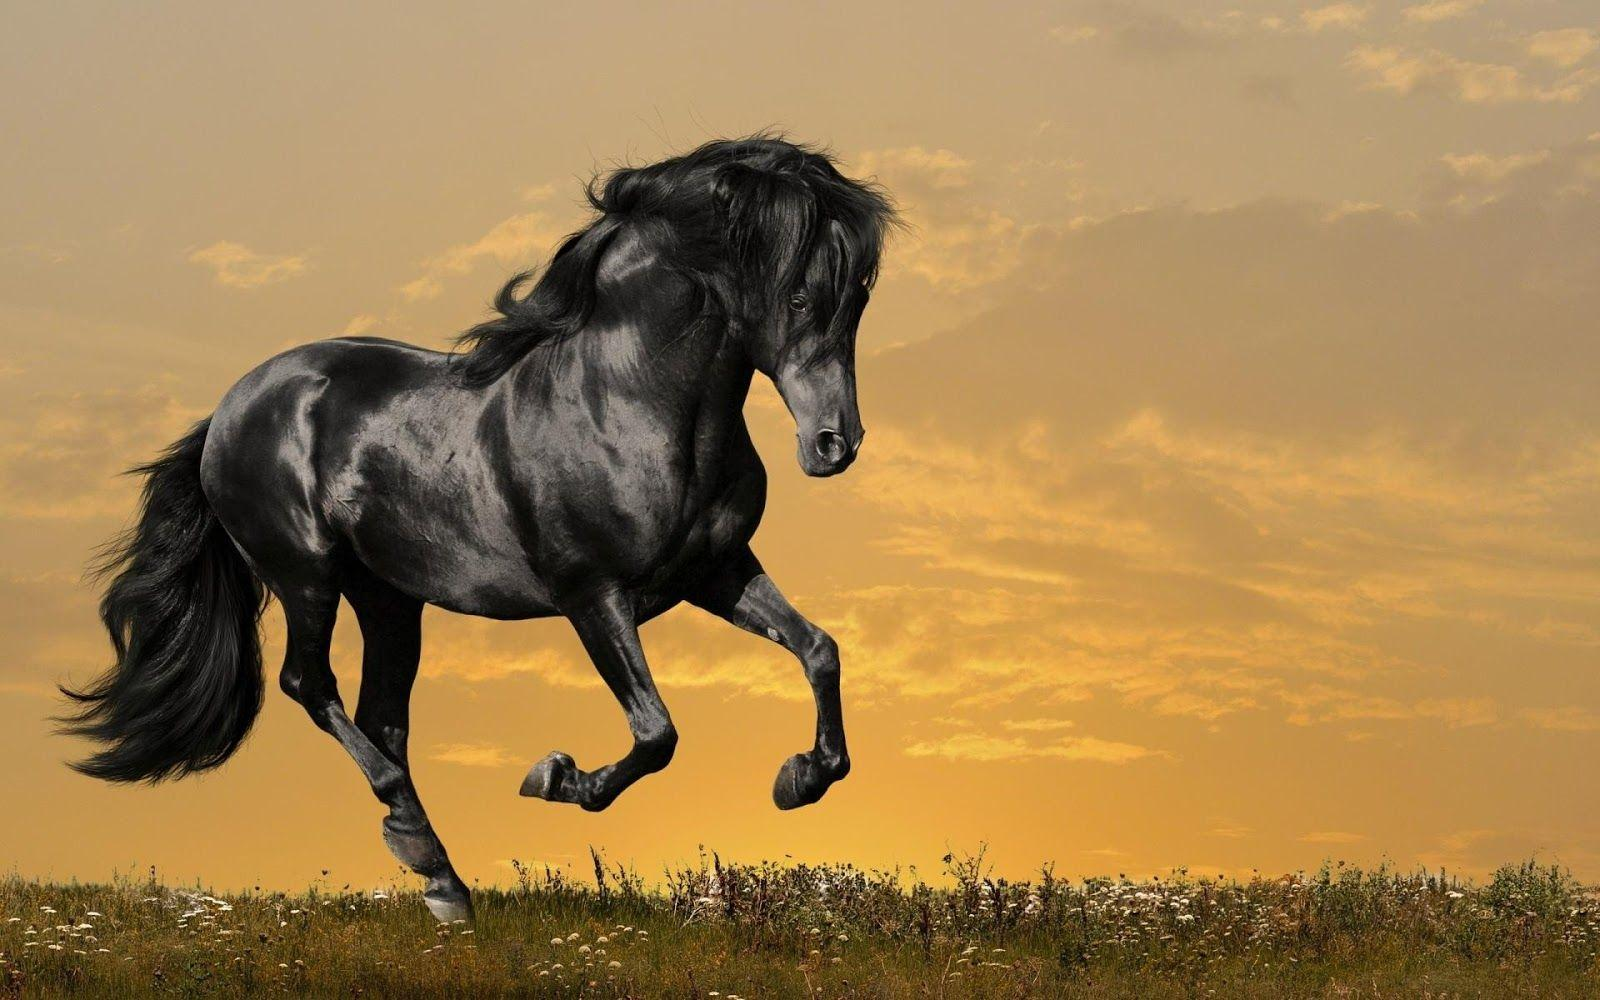 Black Horse Wallpapers - Wallpaper Cave - photo#44